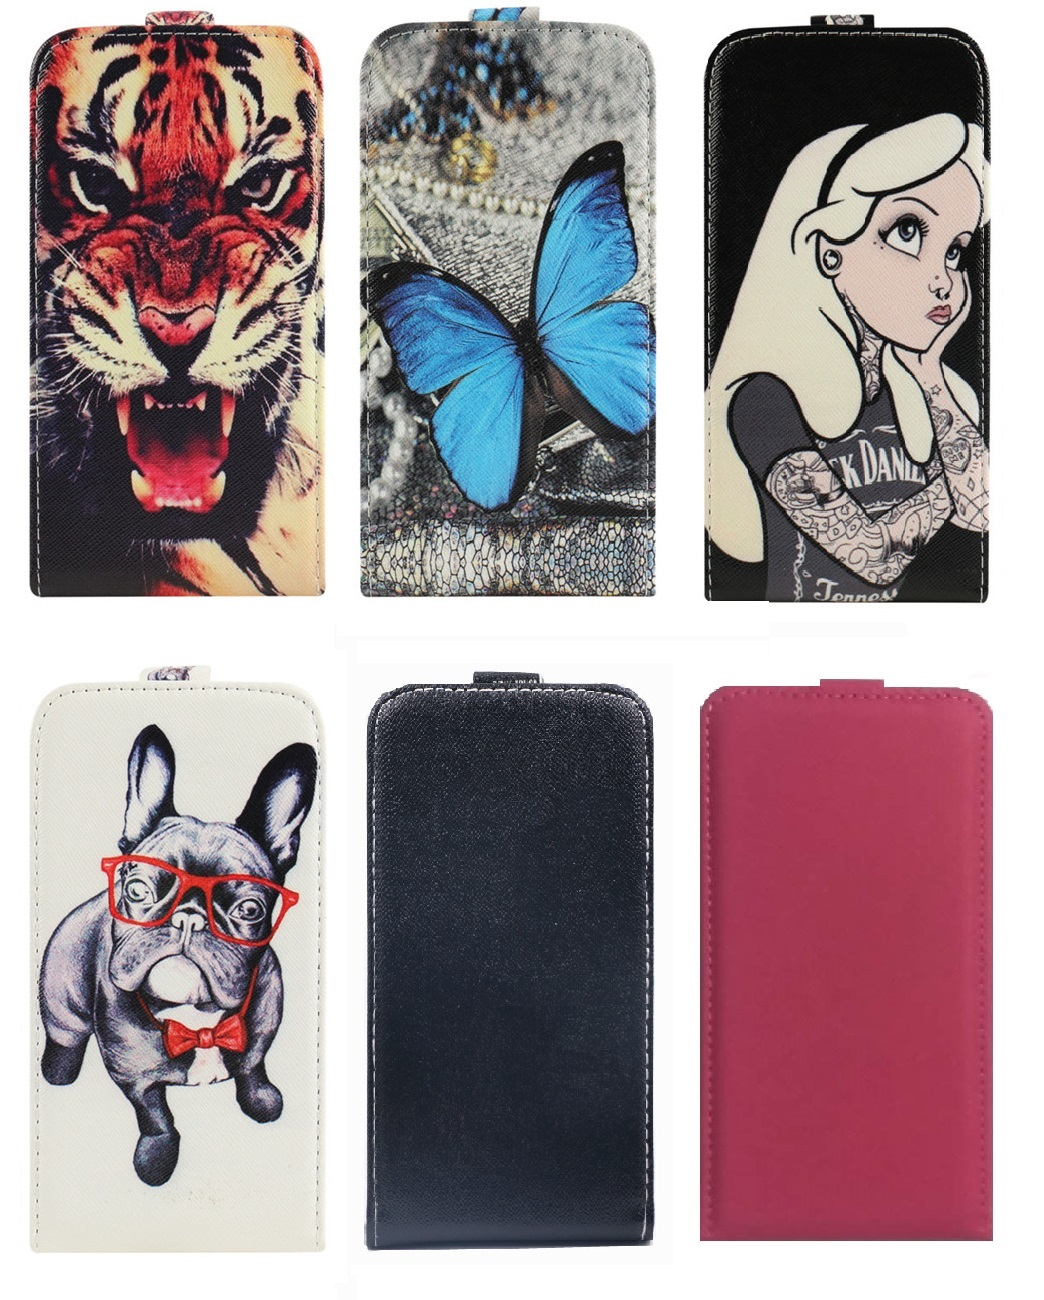 Yooyour PU Case Cover Cover shell shell for Wiko Freddy / U Feel Go / - Բջջային հեռախոսի պարագաներ և պահեստամասեր - Լուսանկար 1